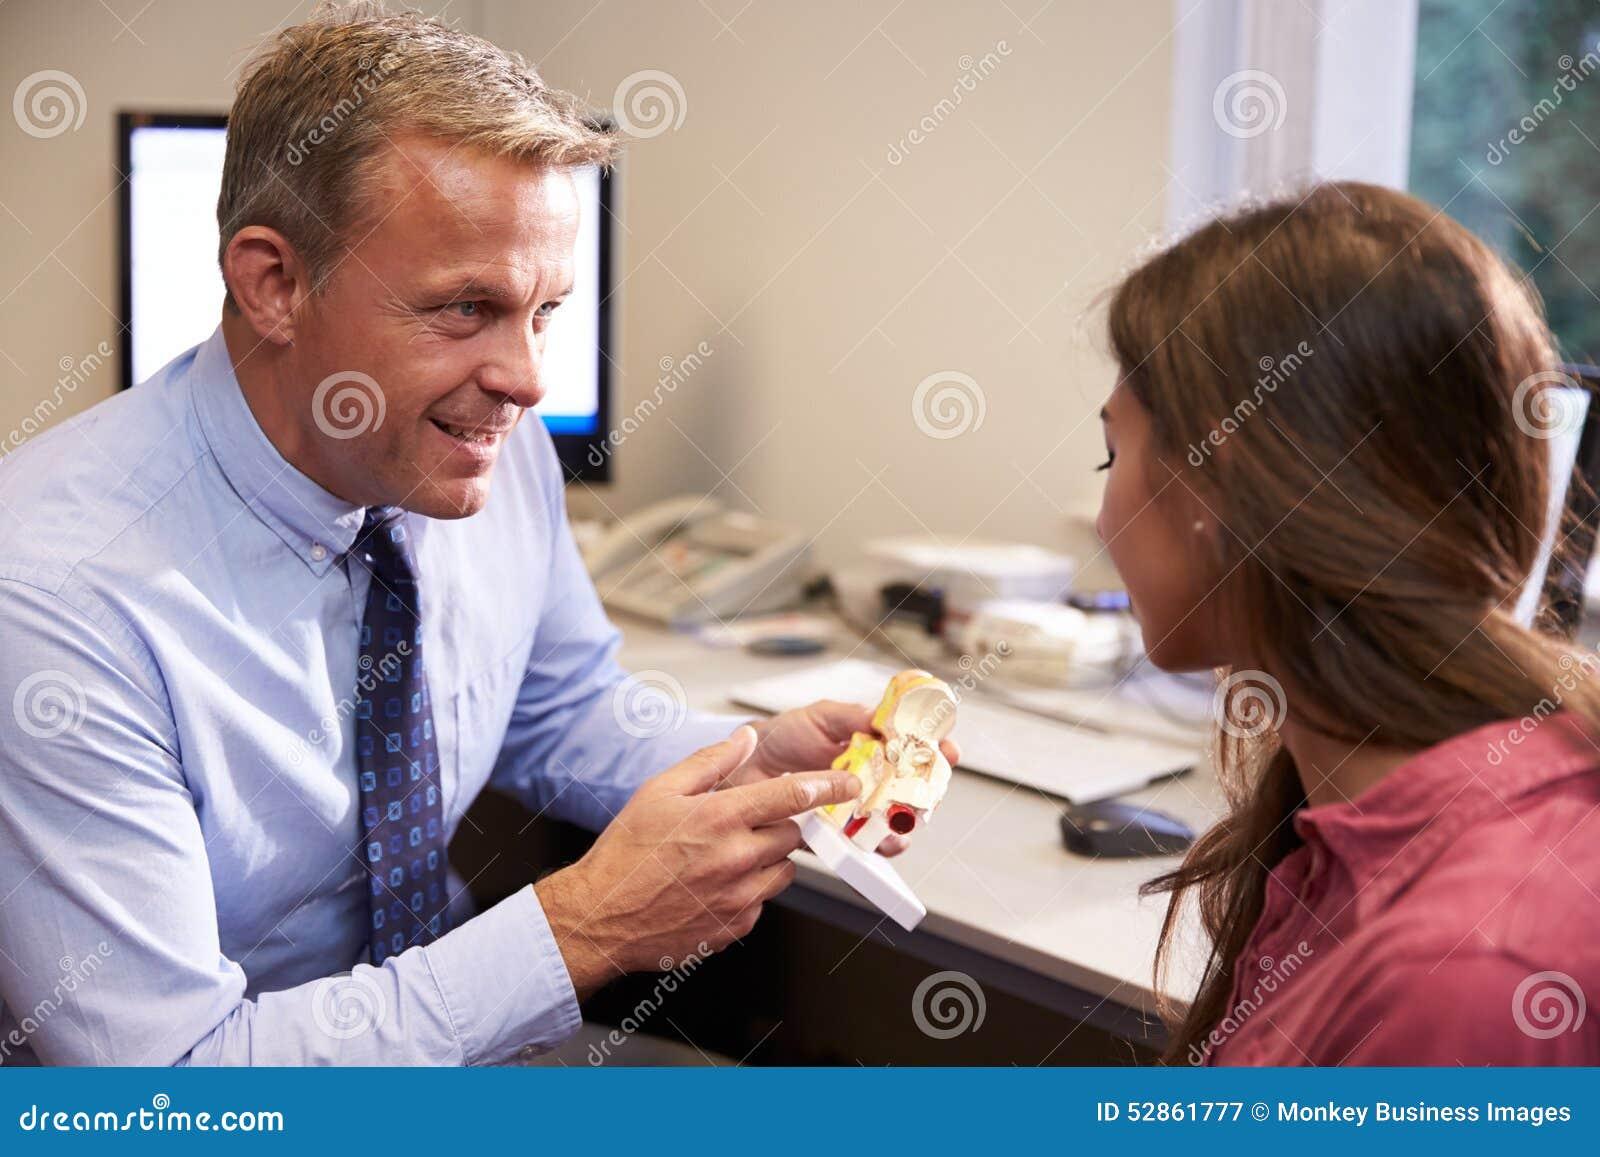 Modello Of Human Ear del dottore Showing Female Patient